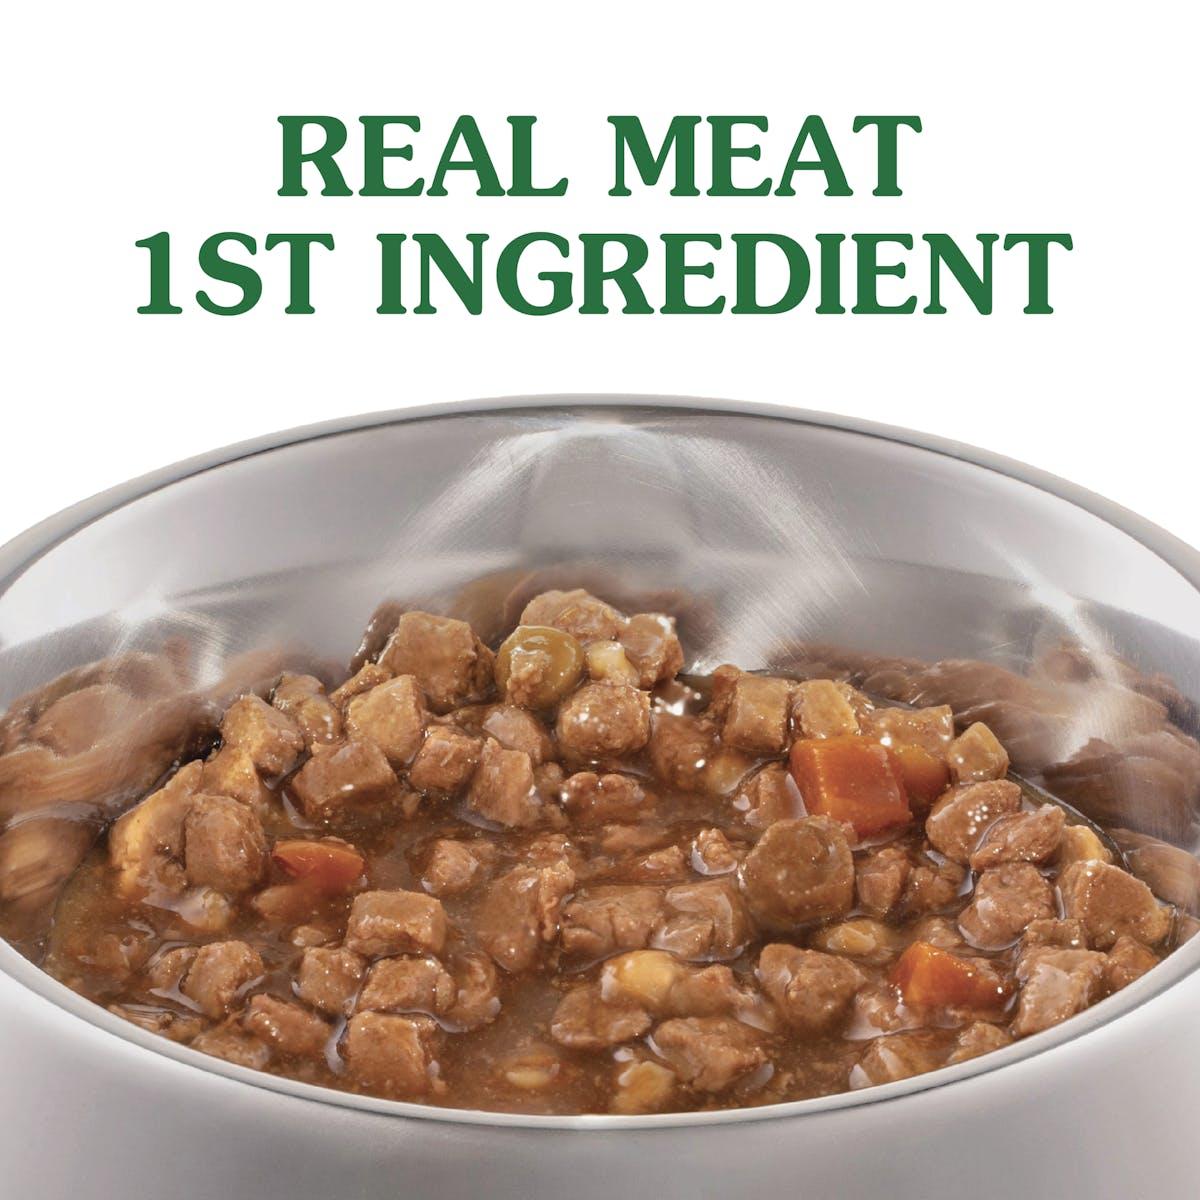 Nature's Gift | Chicken, rice & vegetables | Wet dog food | Left of pack